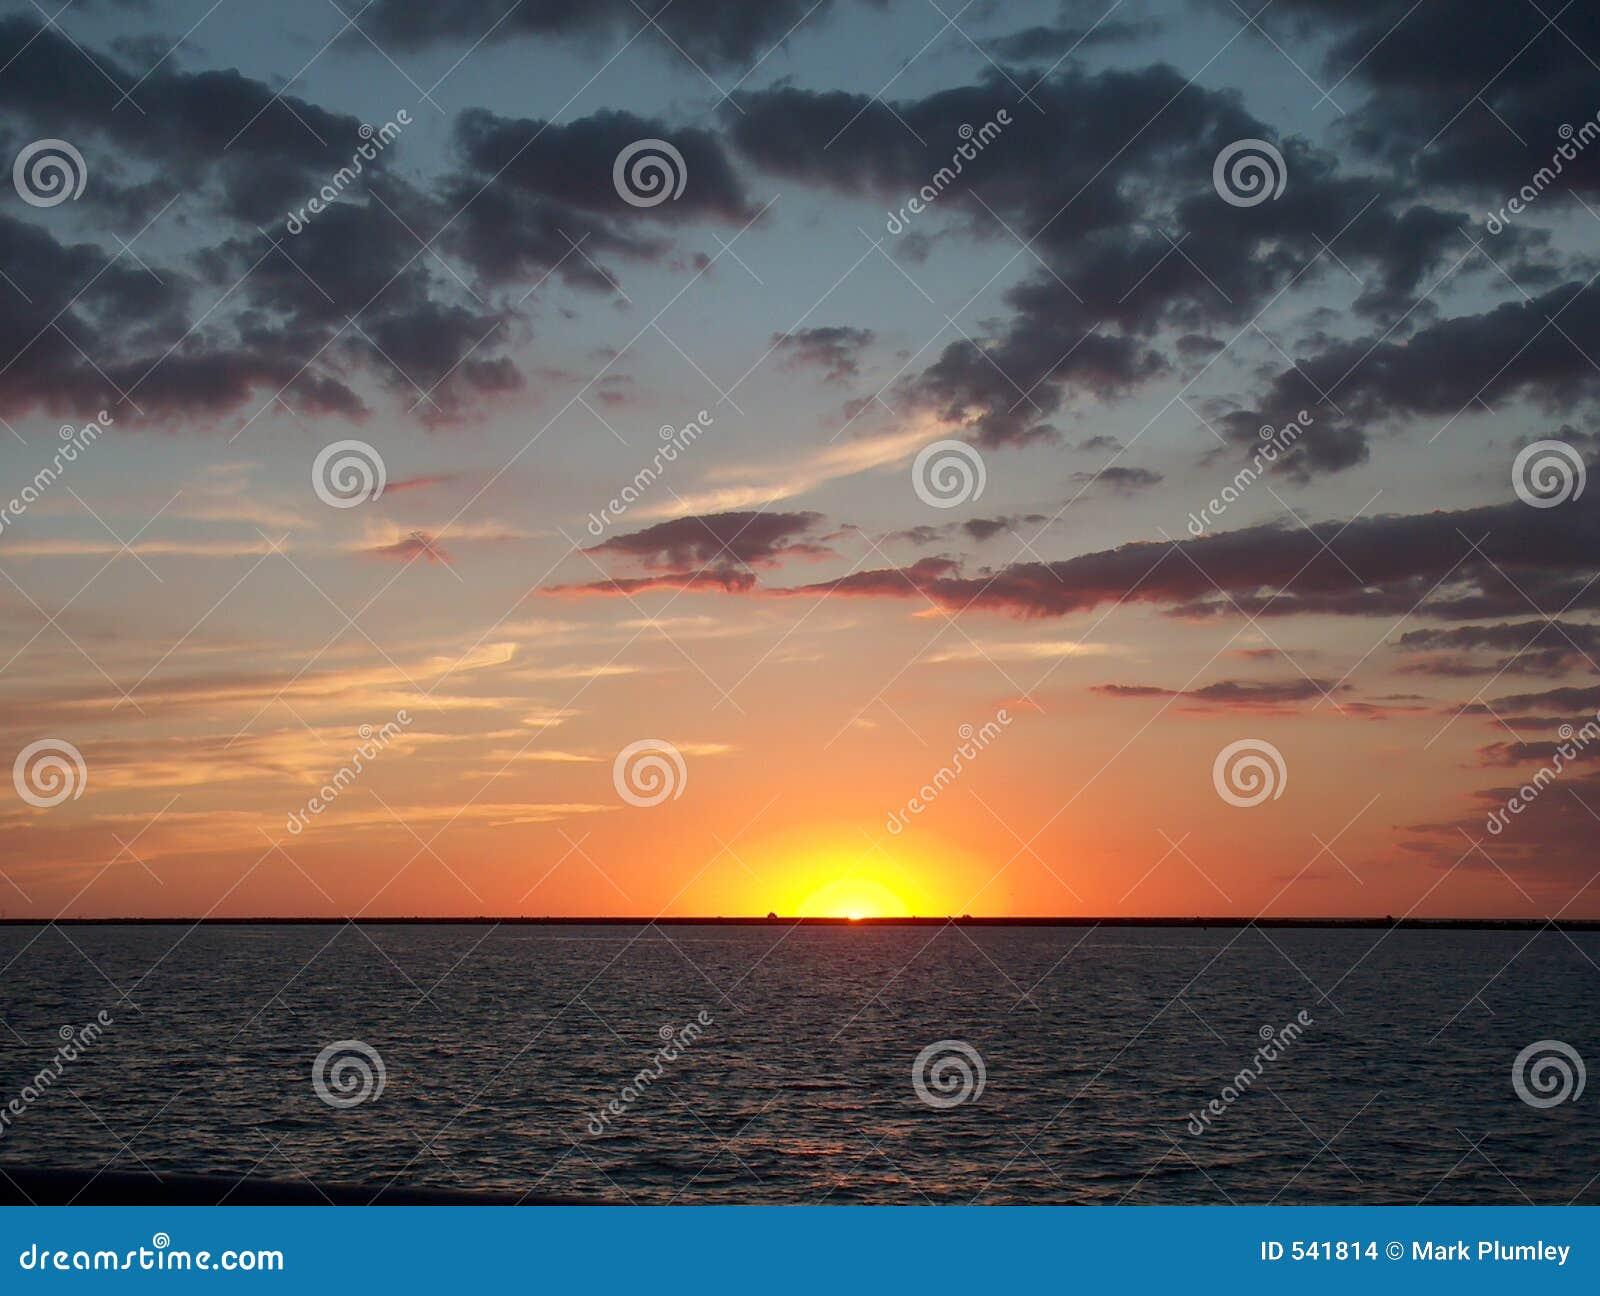 Download 伊利湖日落 库存照片. 图片 包括有 夜间, 微明, 日落, 黄昏, 天空, 海运, 云彩 - 541814